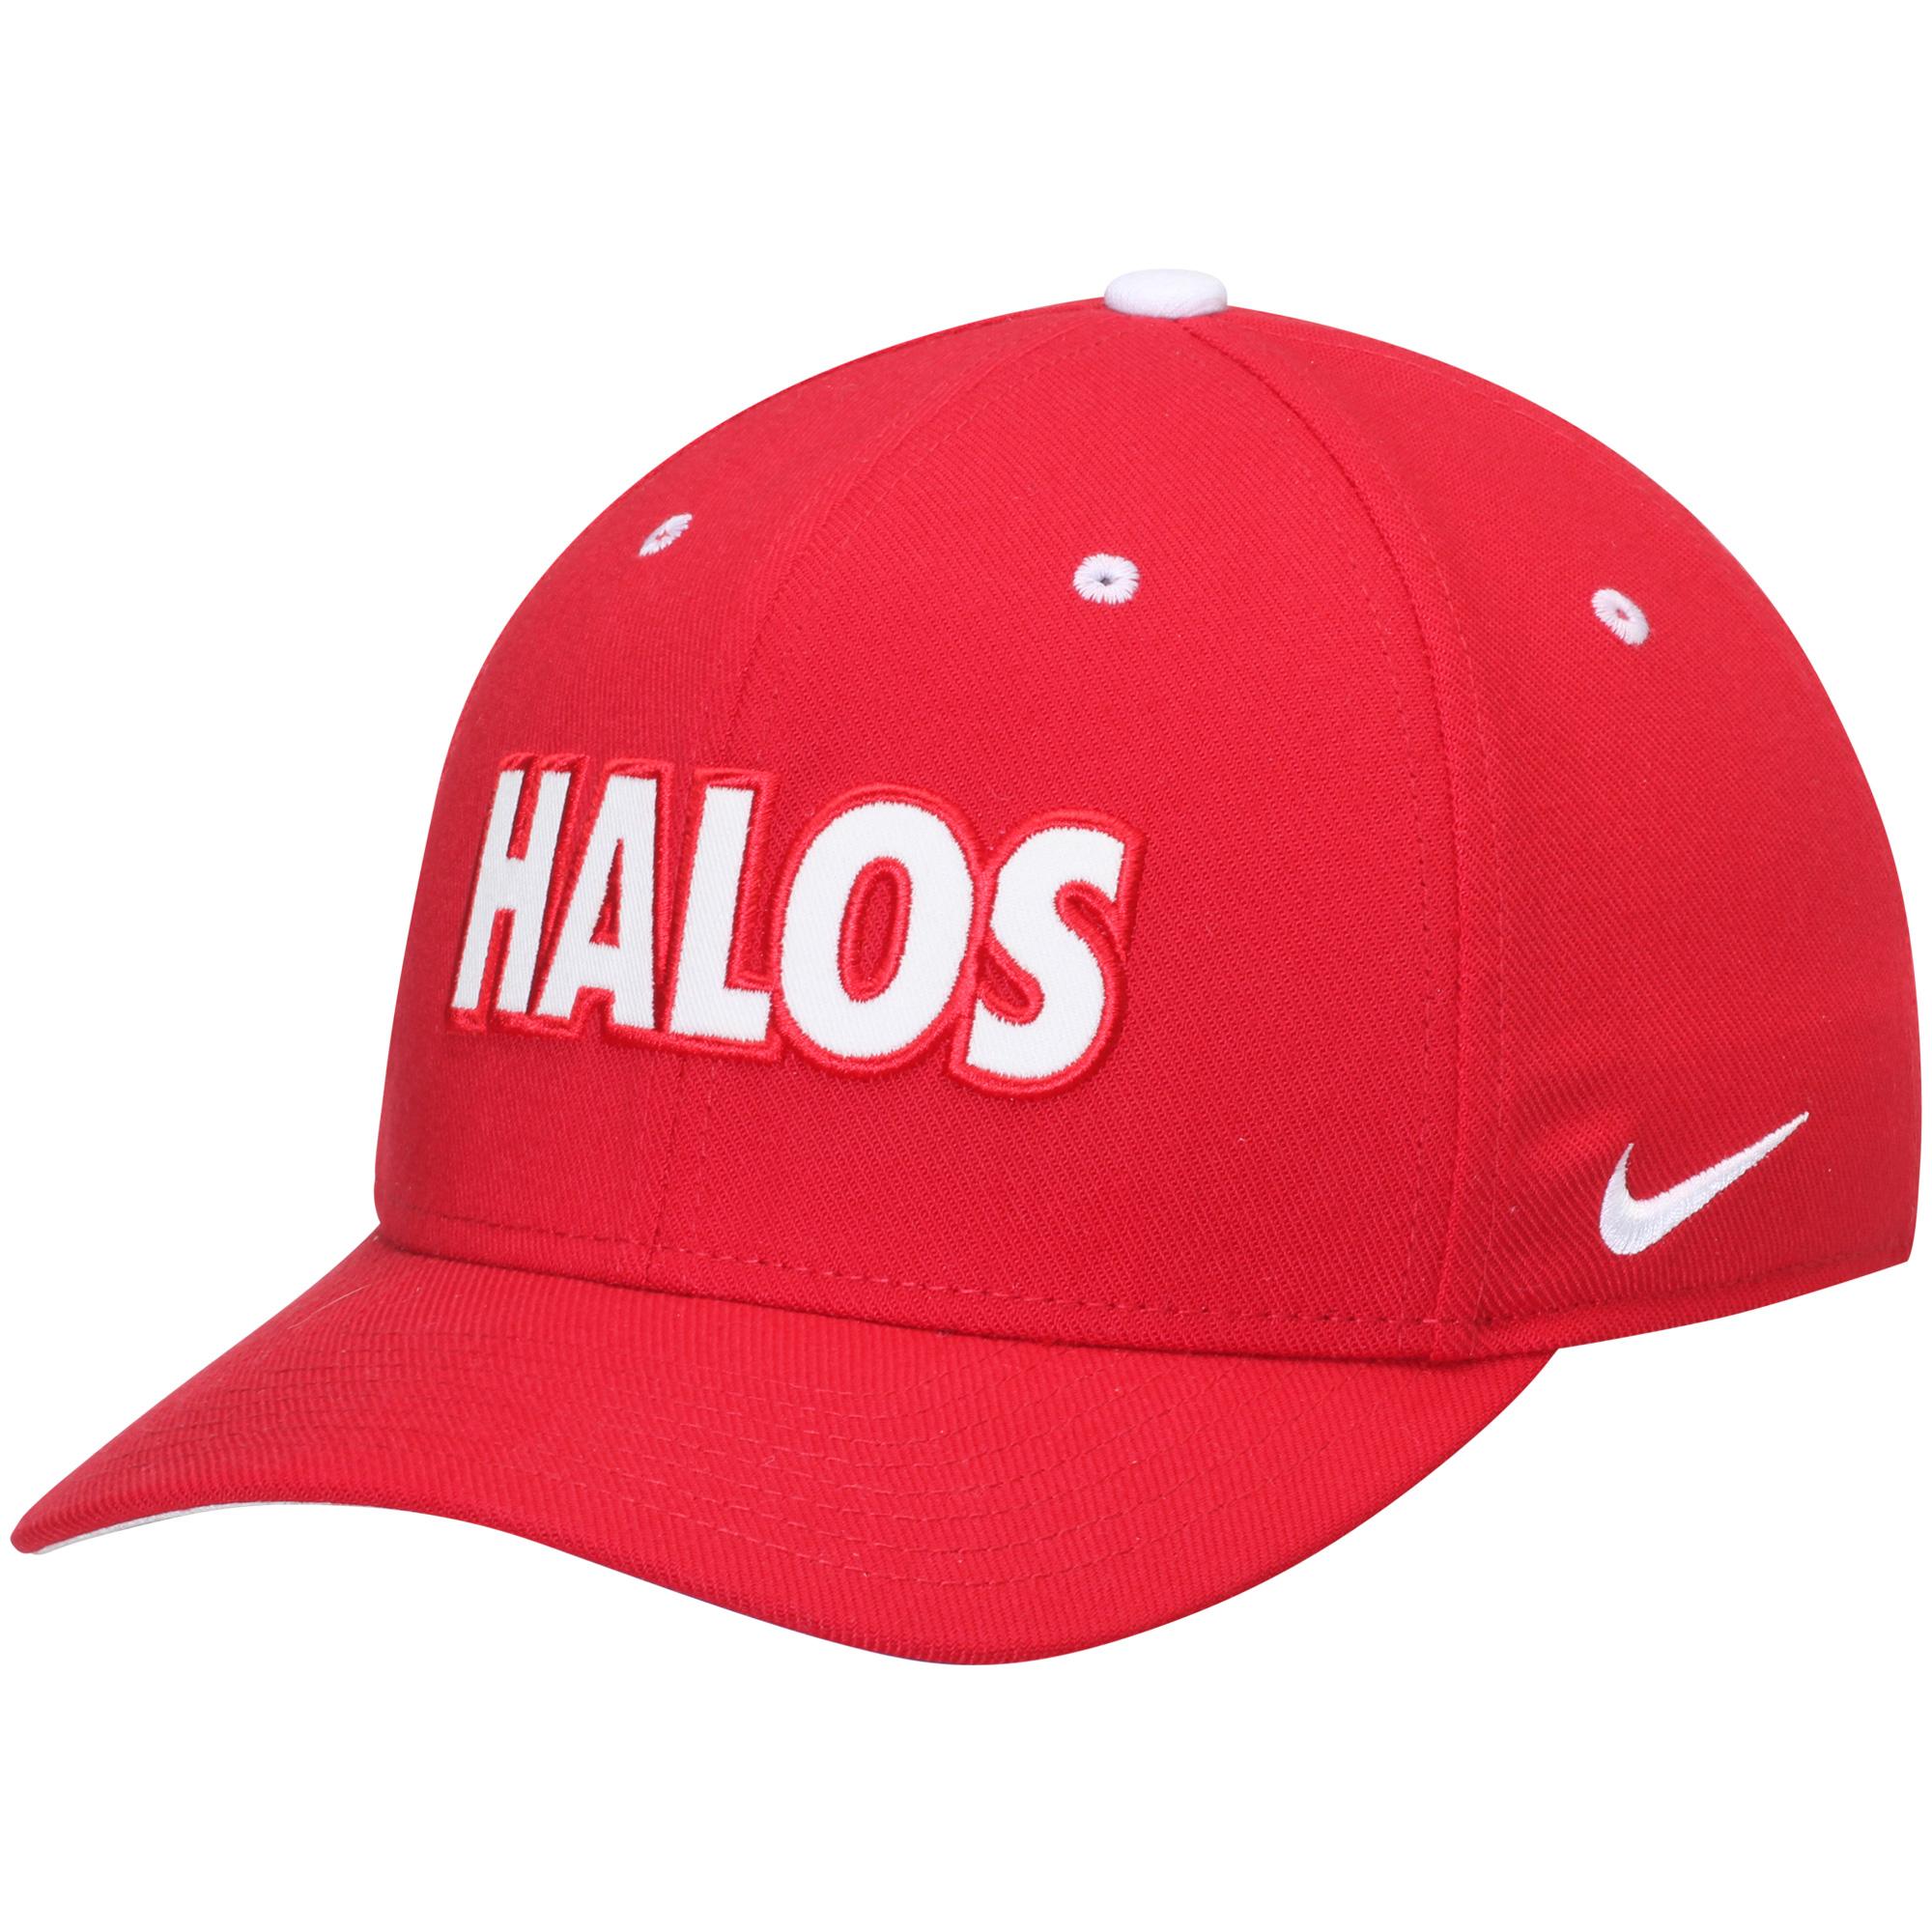 Men's Nike Red Los Angeles Angels Local Classic Swoosh Performance Flex Hat